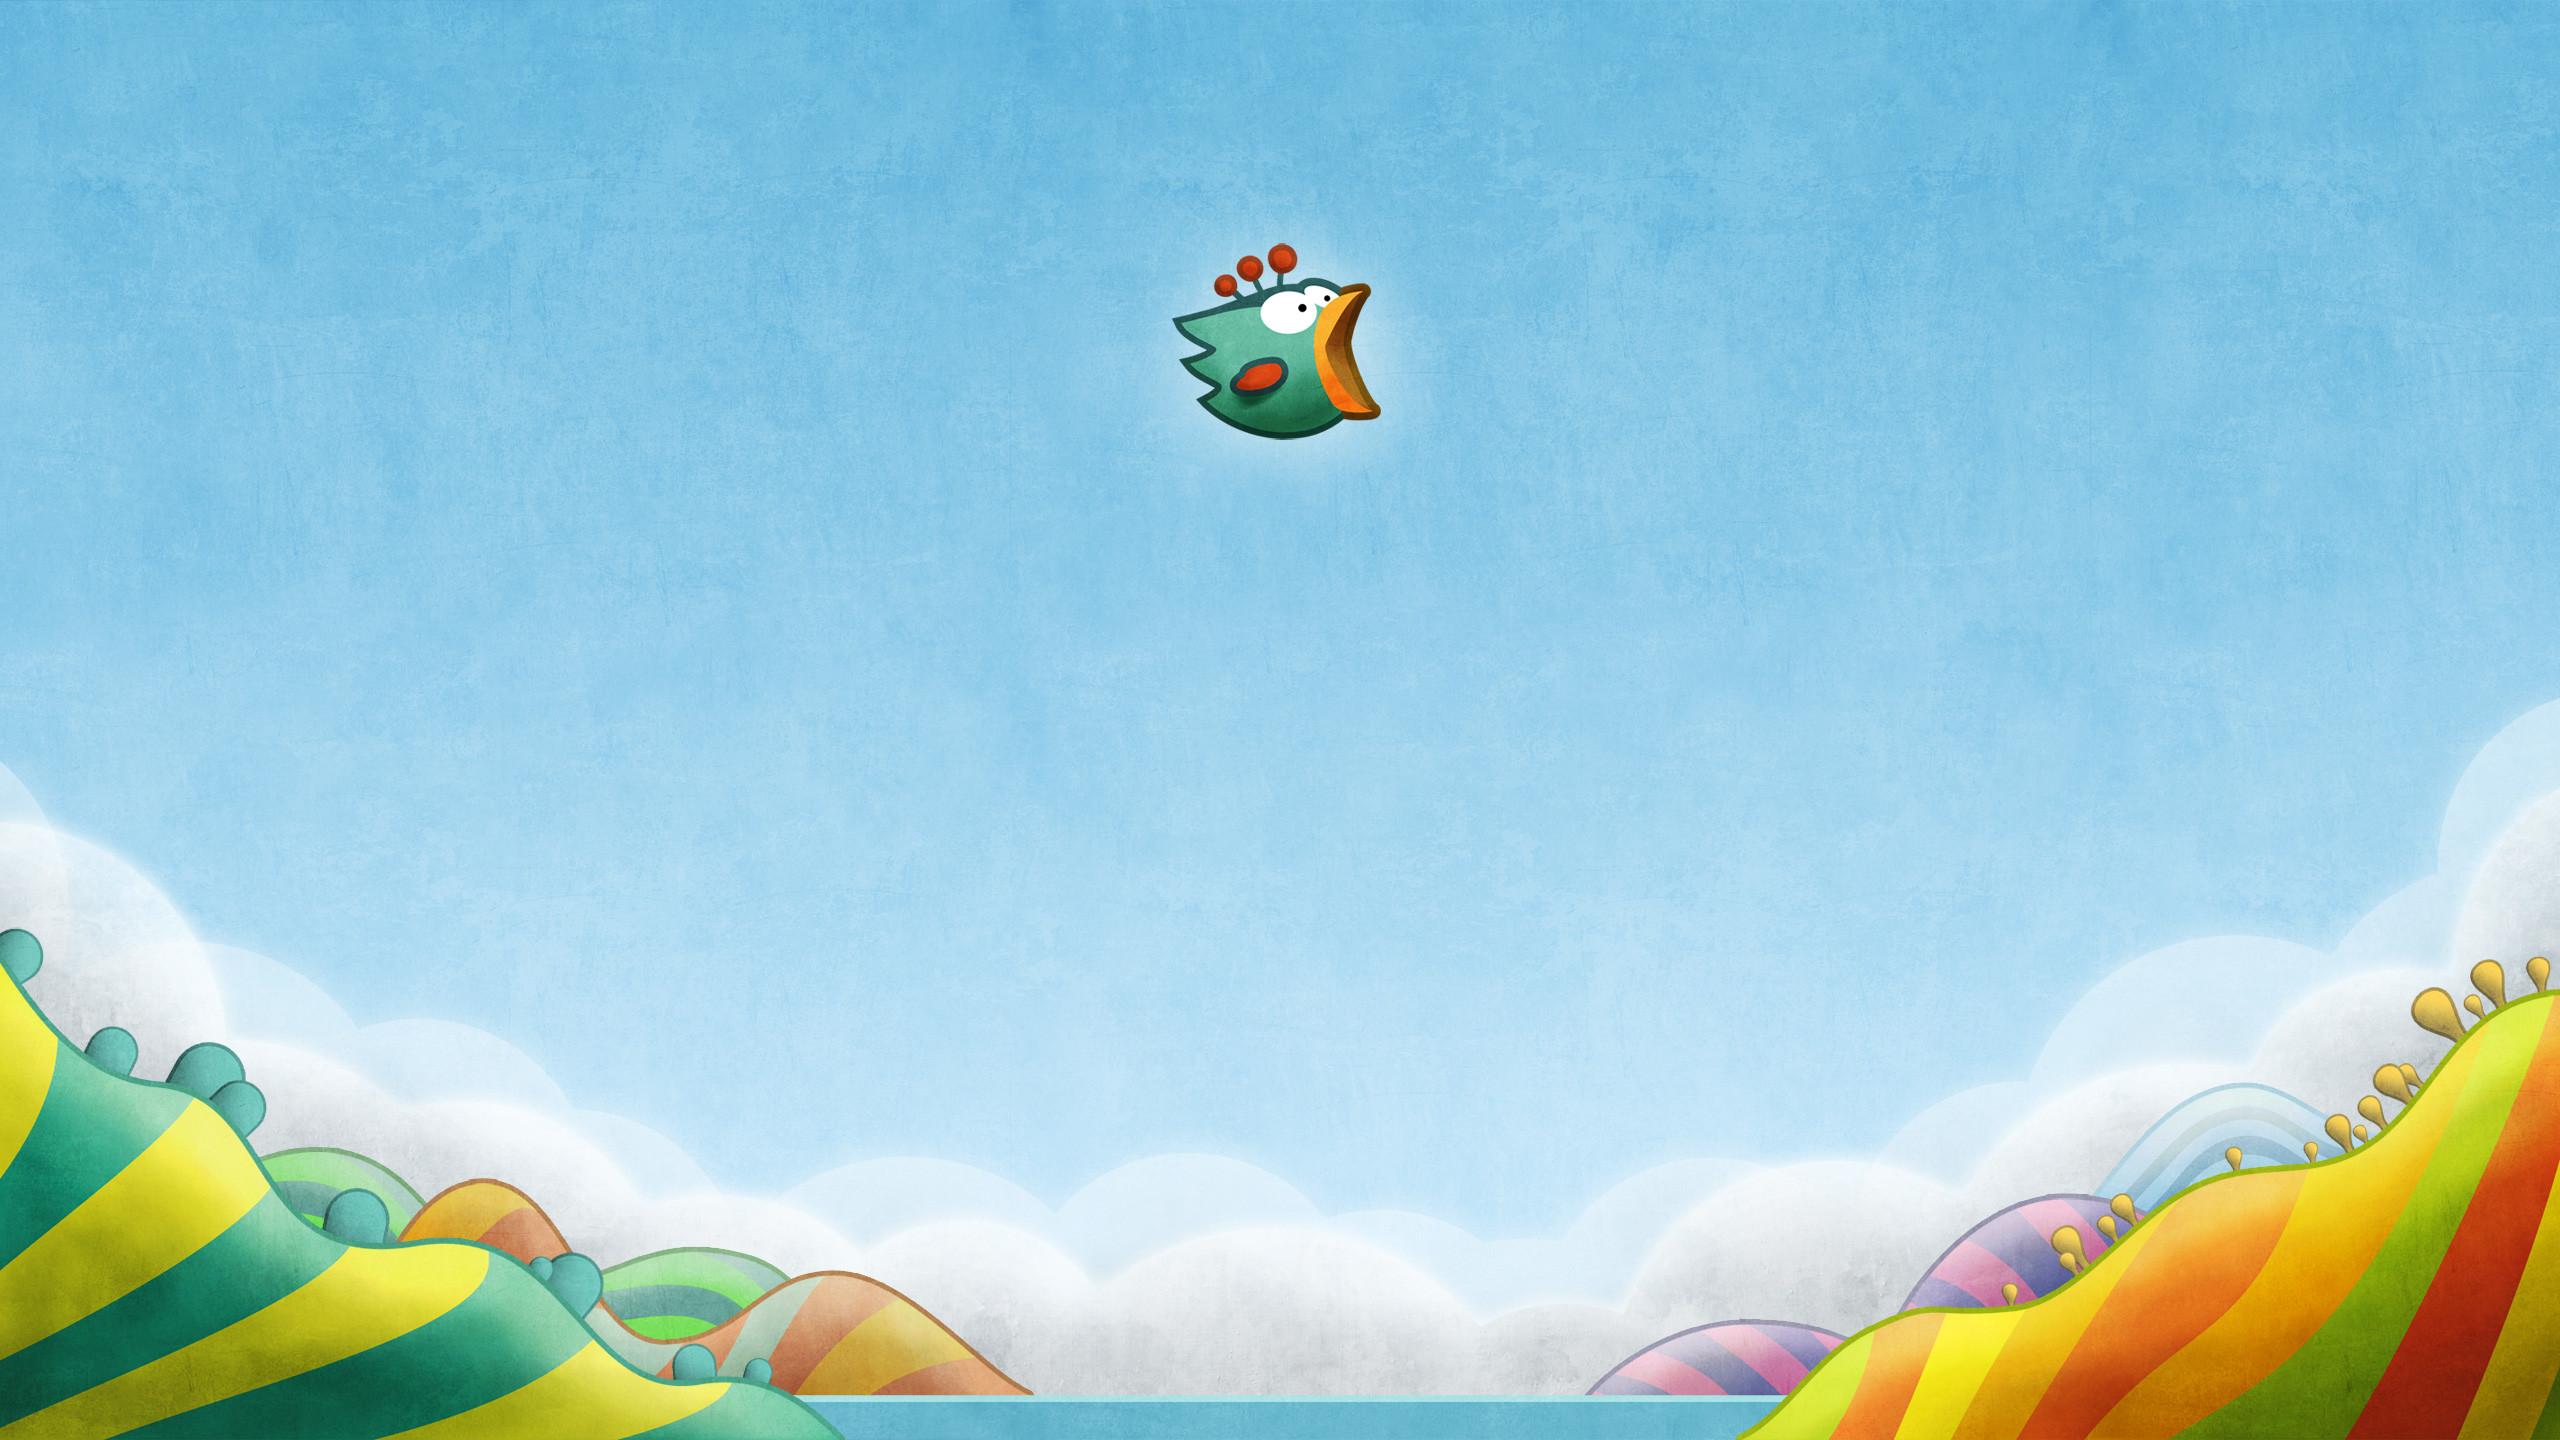 Tiny Wings Desktop Wallpaper 2560 x 1440